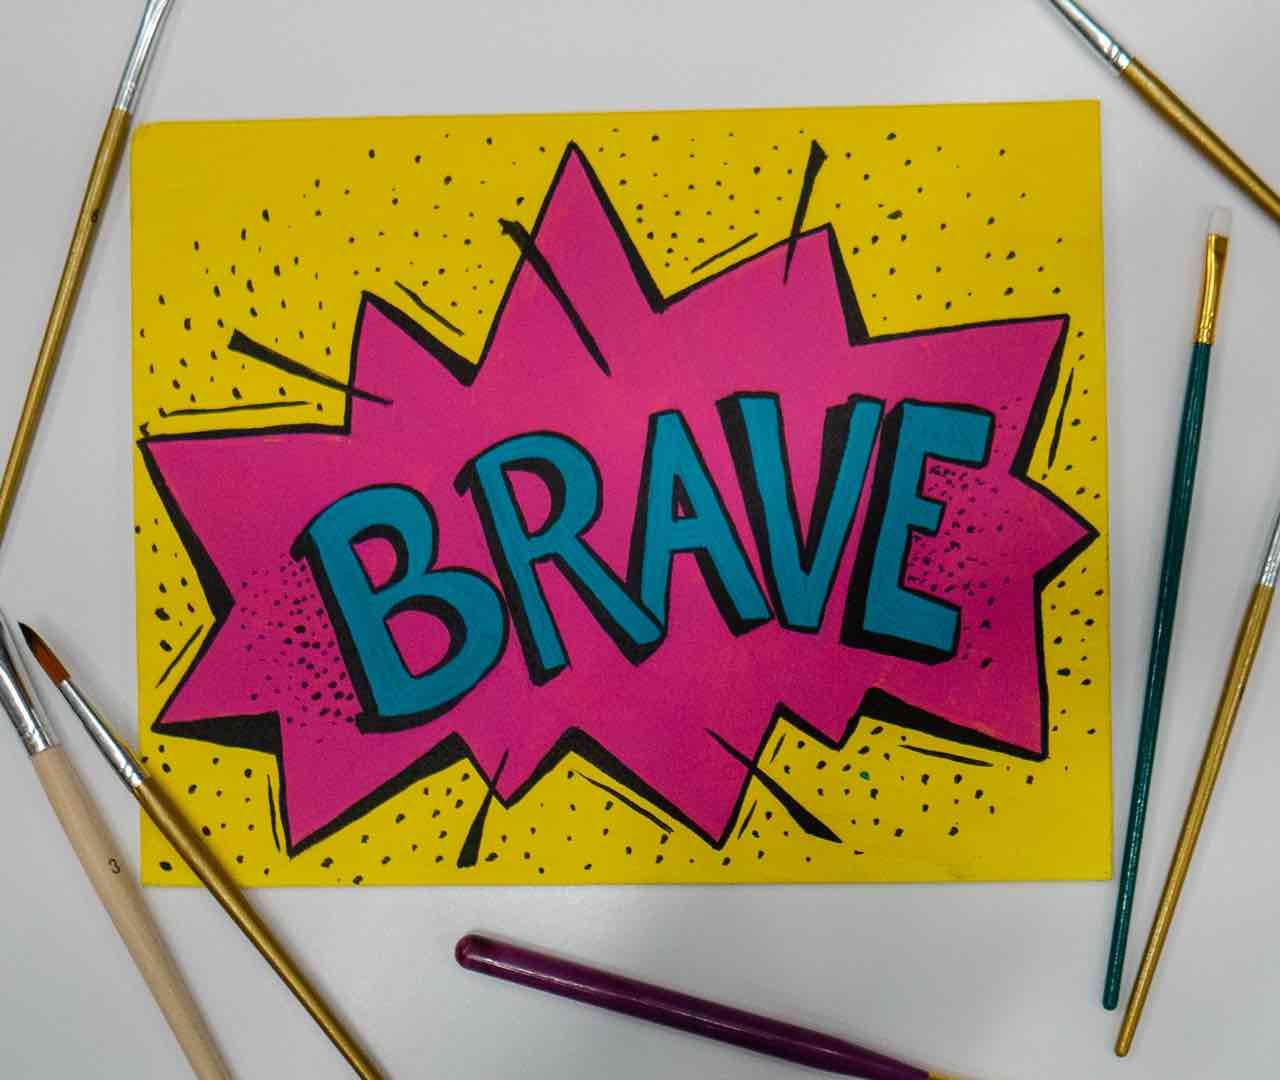 Brave-small.jpg